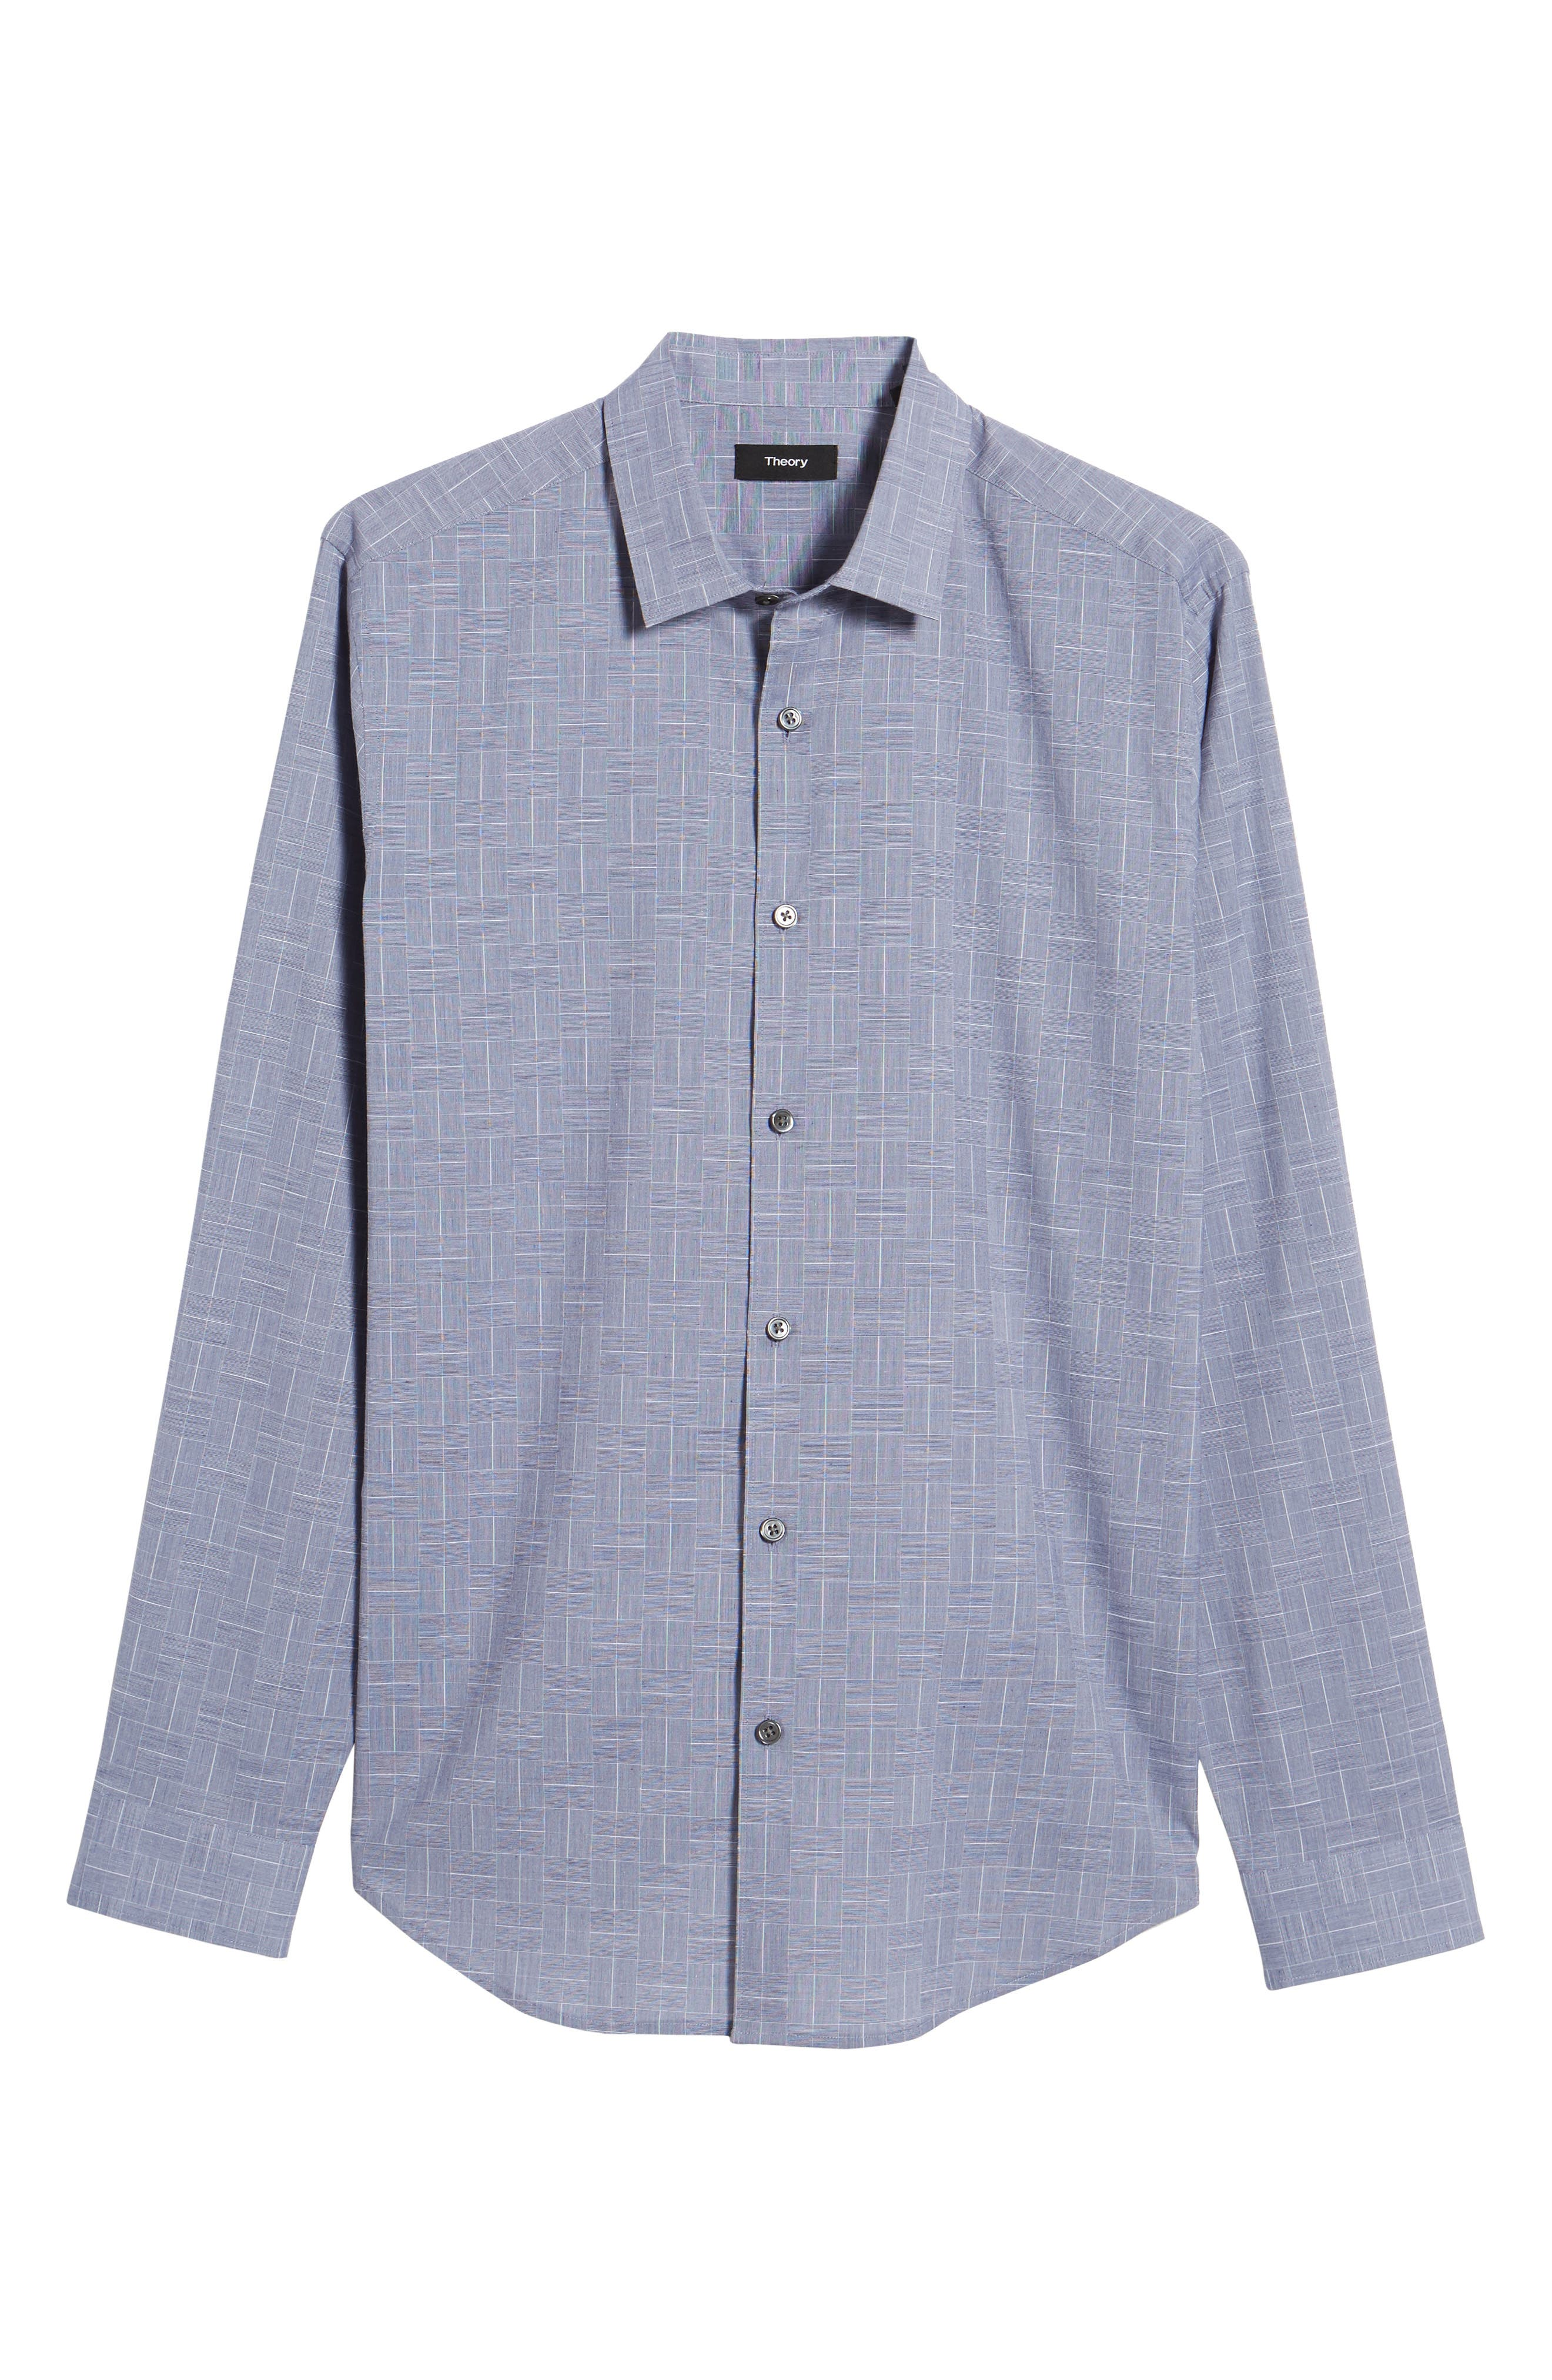 Murrary Indy Regular Fit Solid Cotton & Linen Sport Shirt,                             Alternate thumbnail 6, color,                             Finch